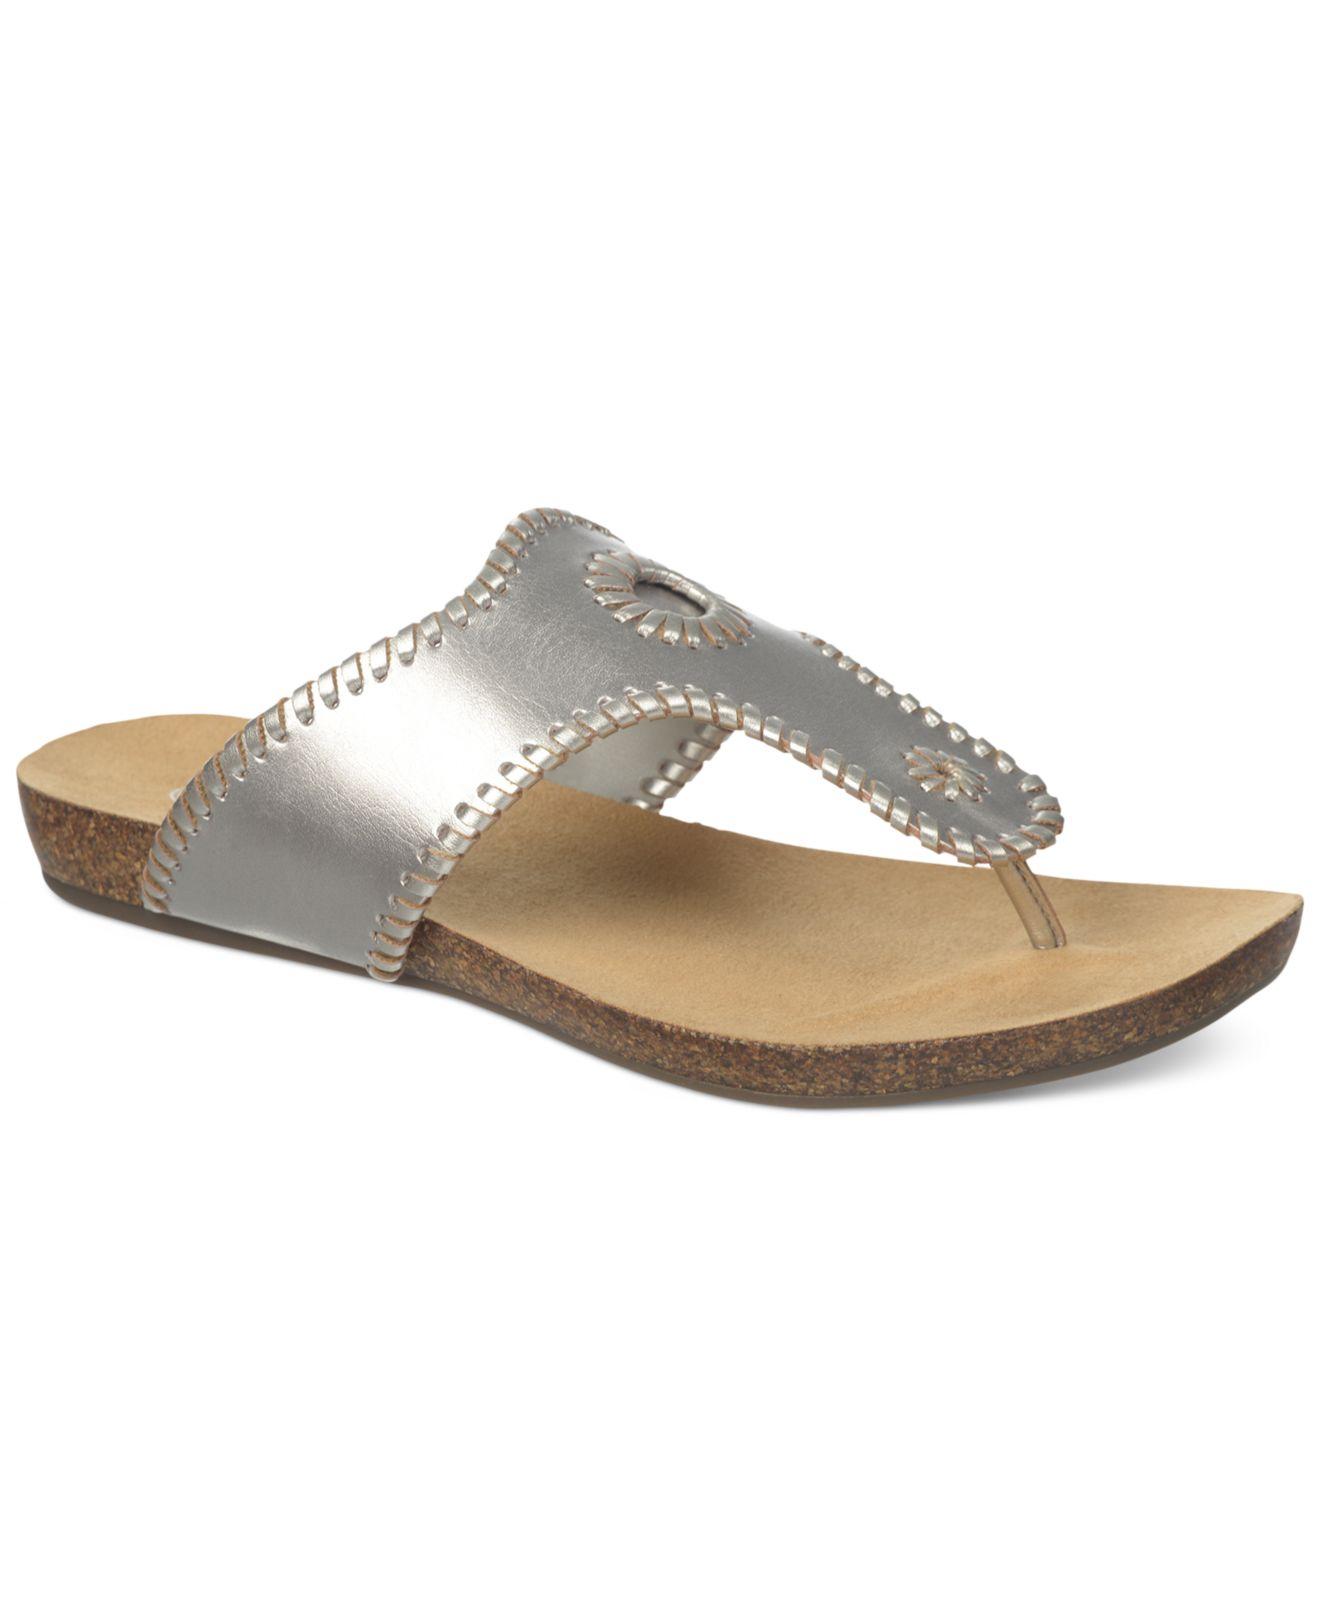 251de4e49c9a6 Lyst - Dr. Scholls Ridley Footbed Thong Sandals in Metallic